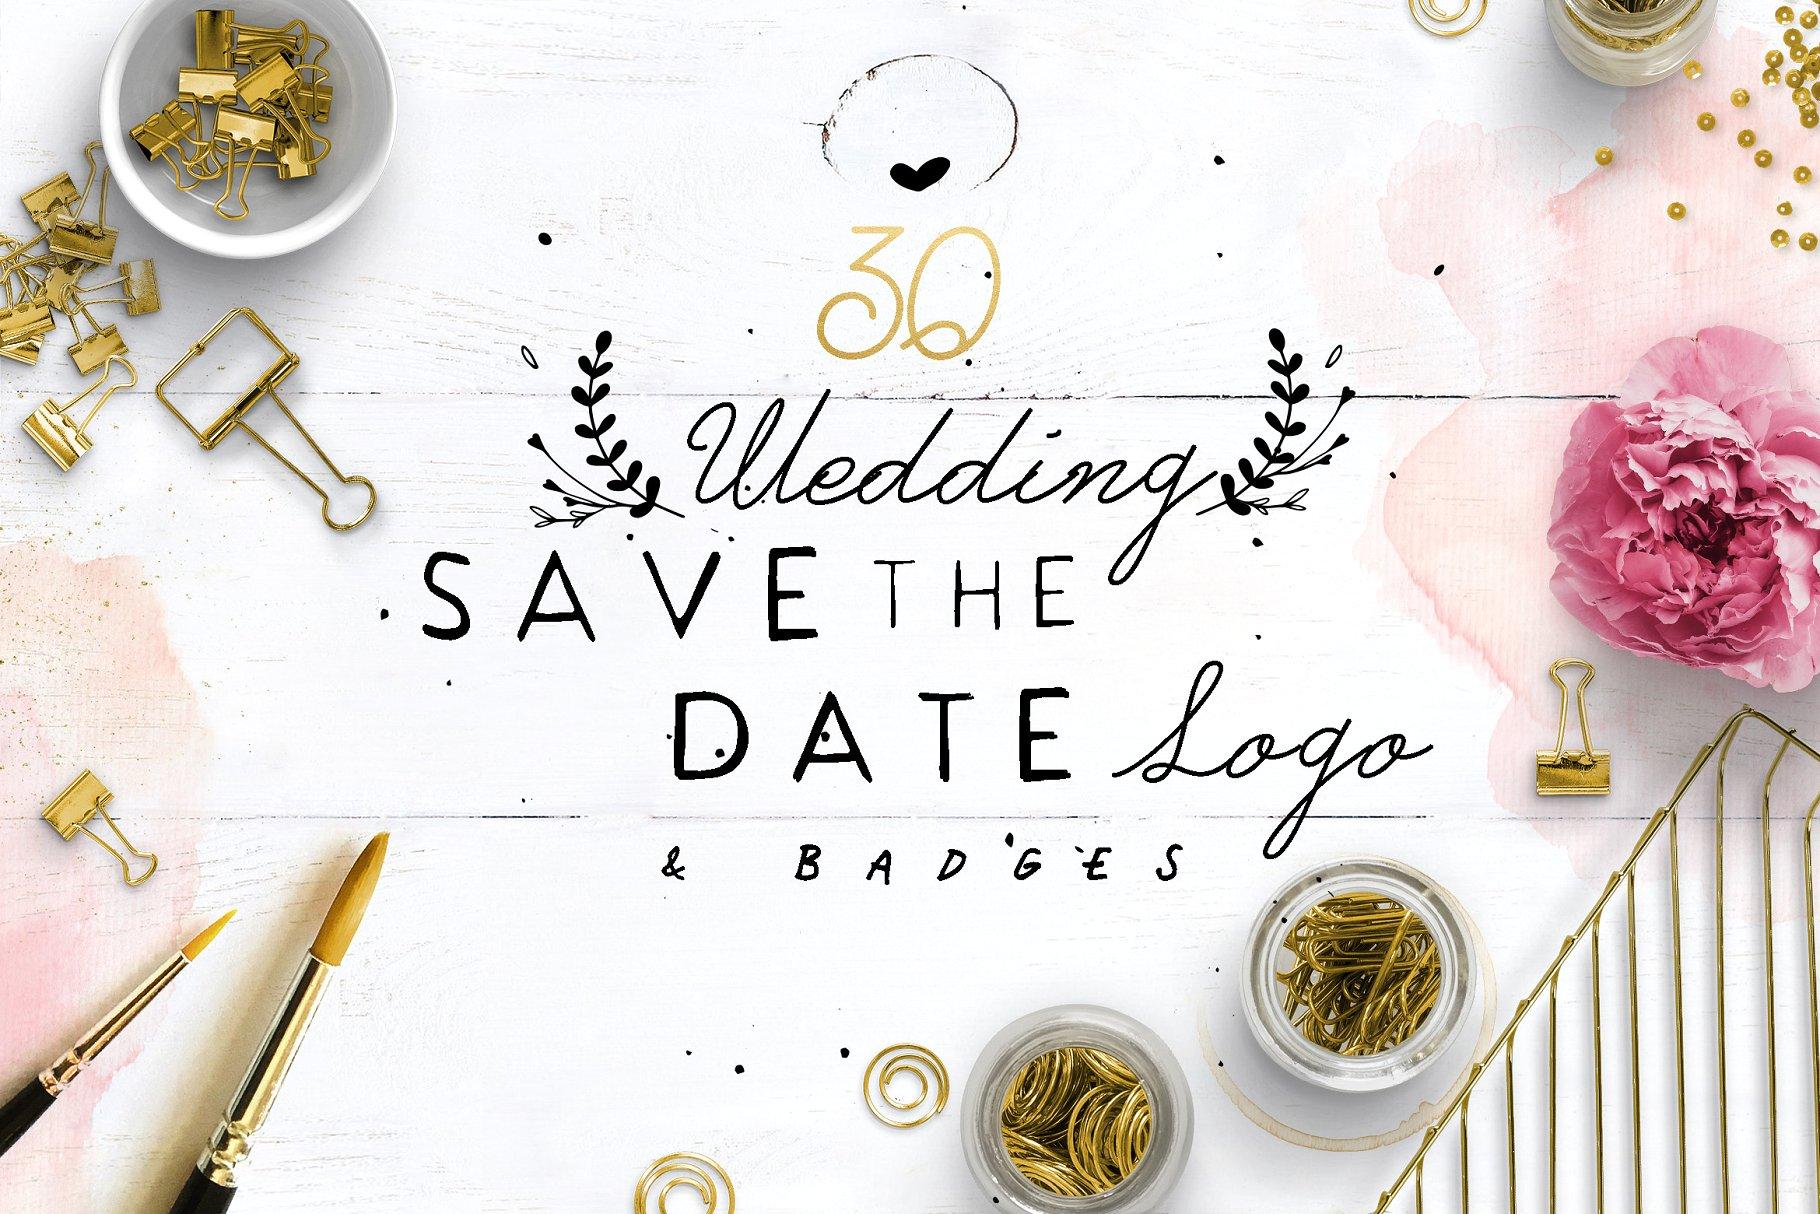 30-save-the-date-wreath-logo-2-.jpg